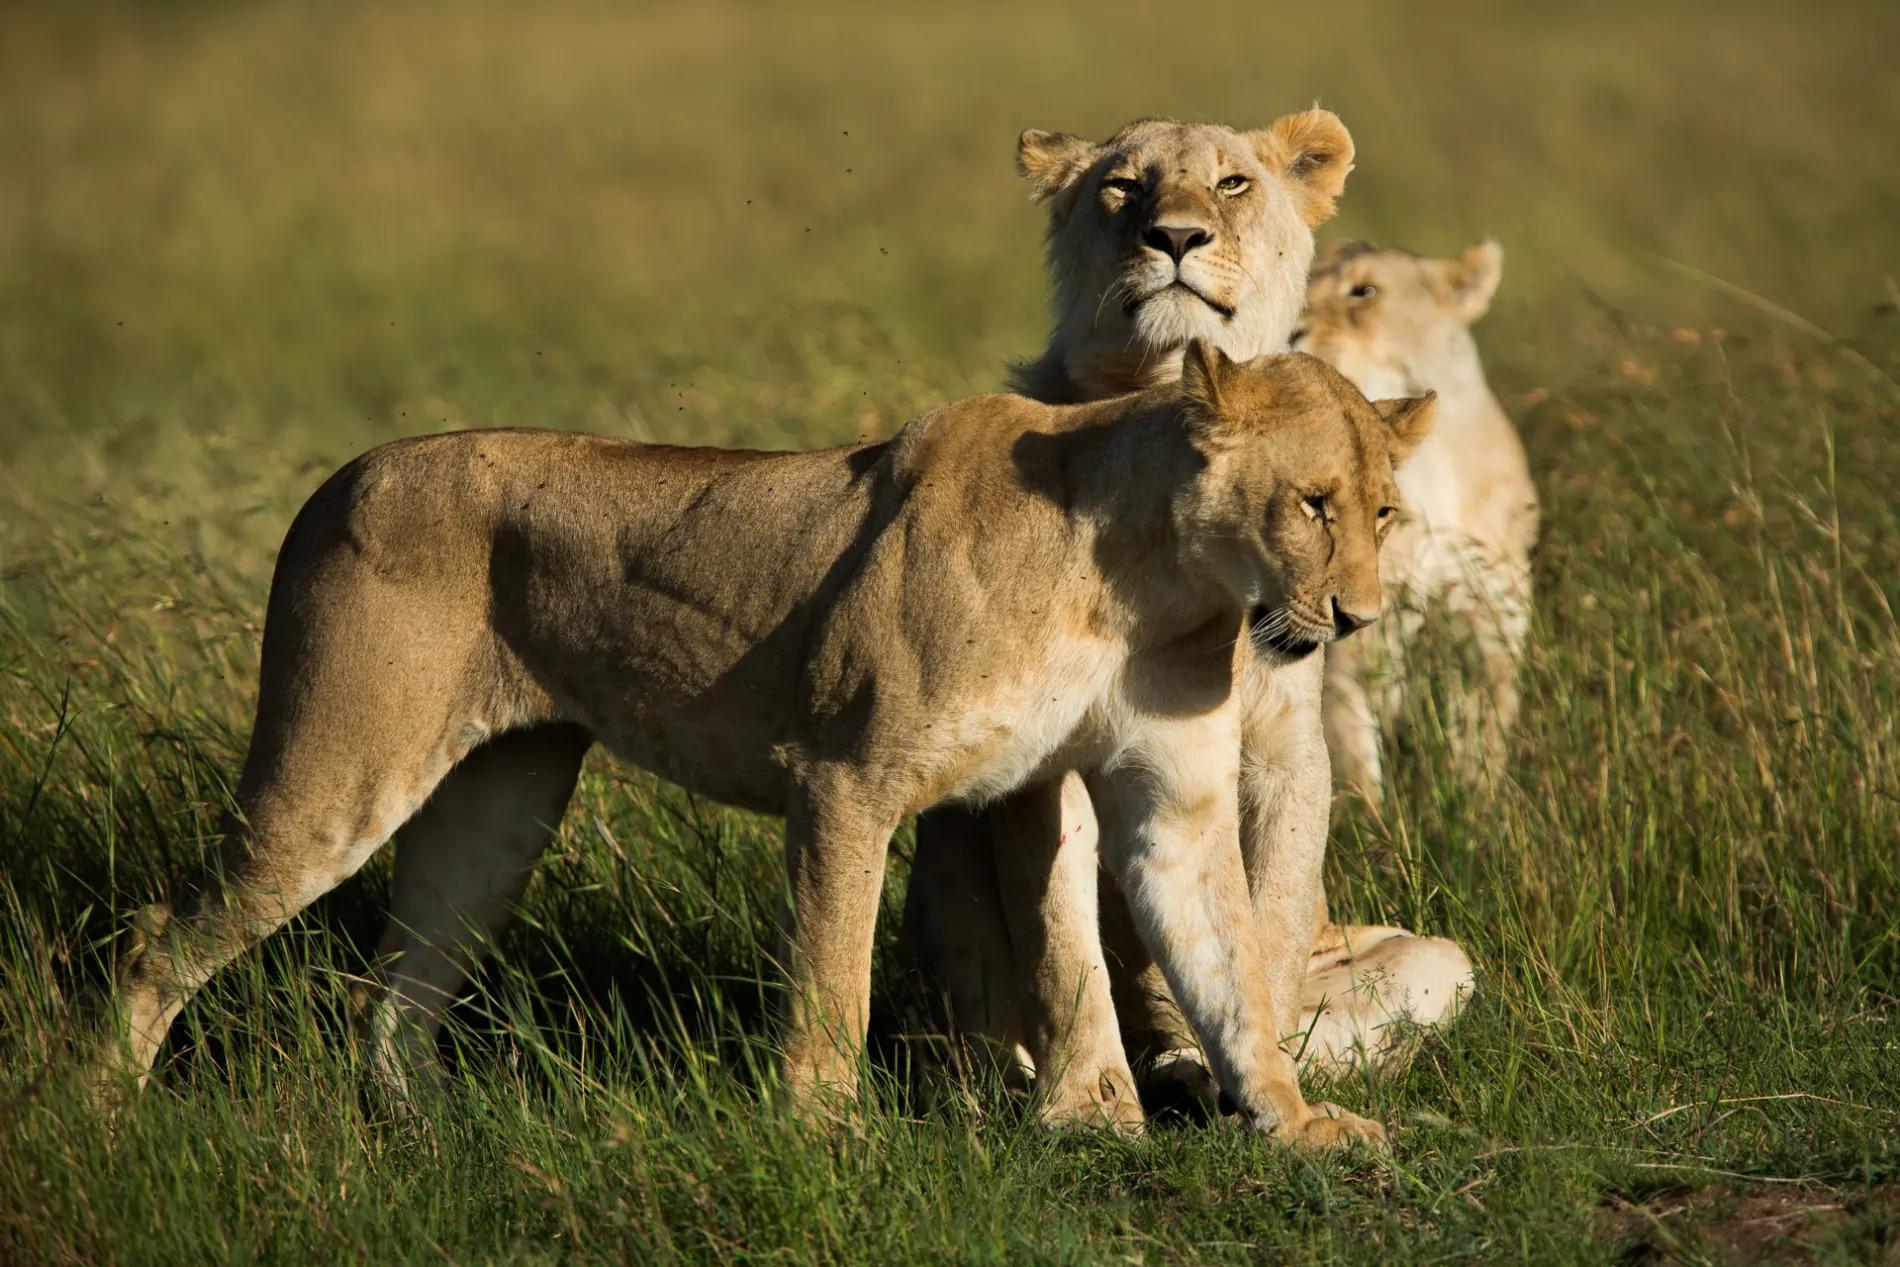 lions together